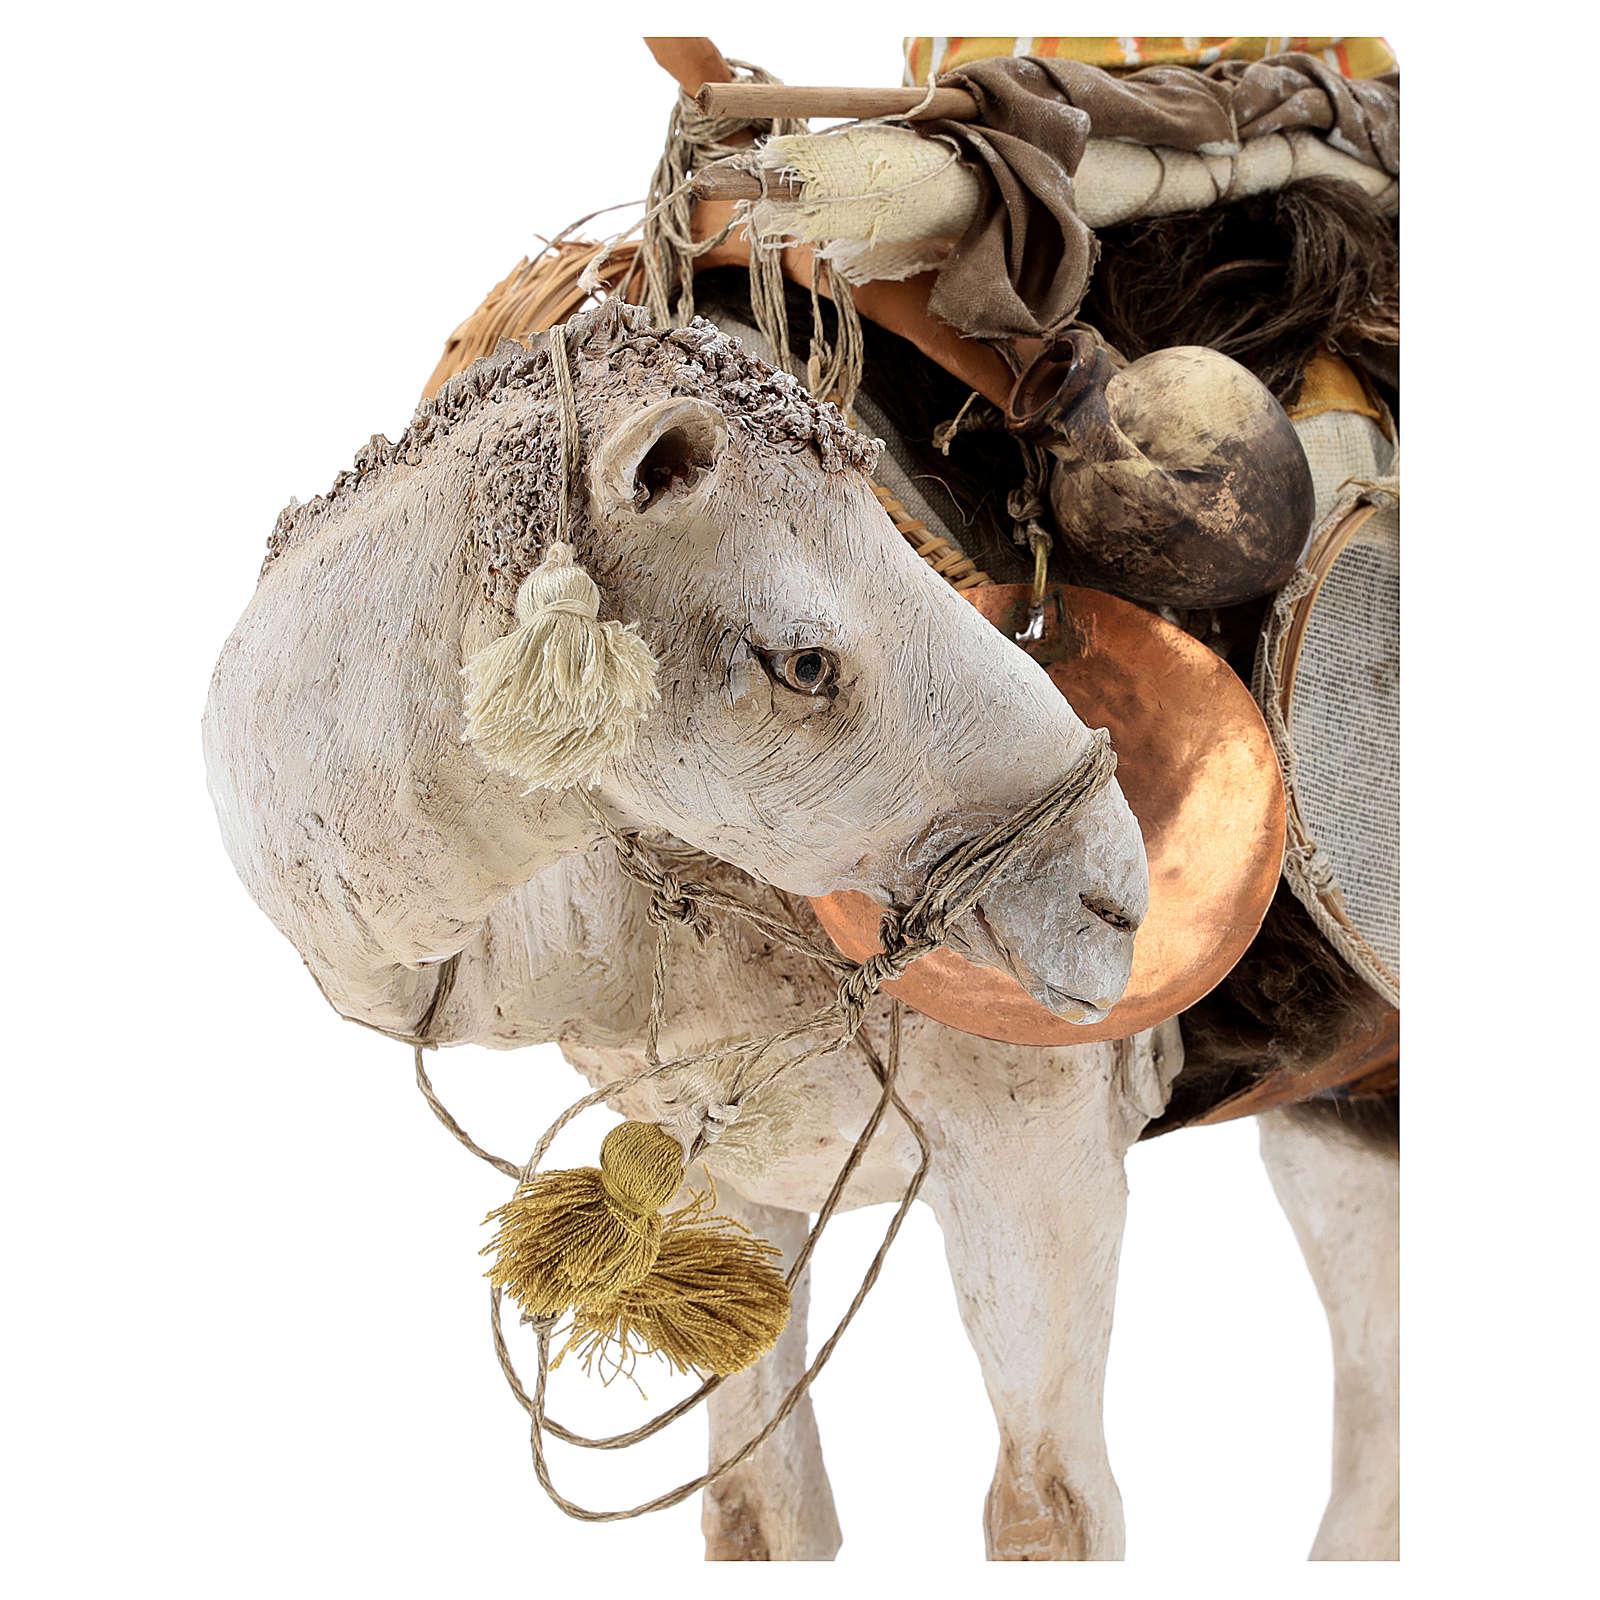 Nativity scene figurine, standing loaded camel by Angela Tripi 40 cm 4